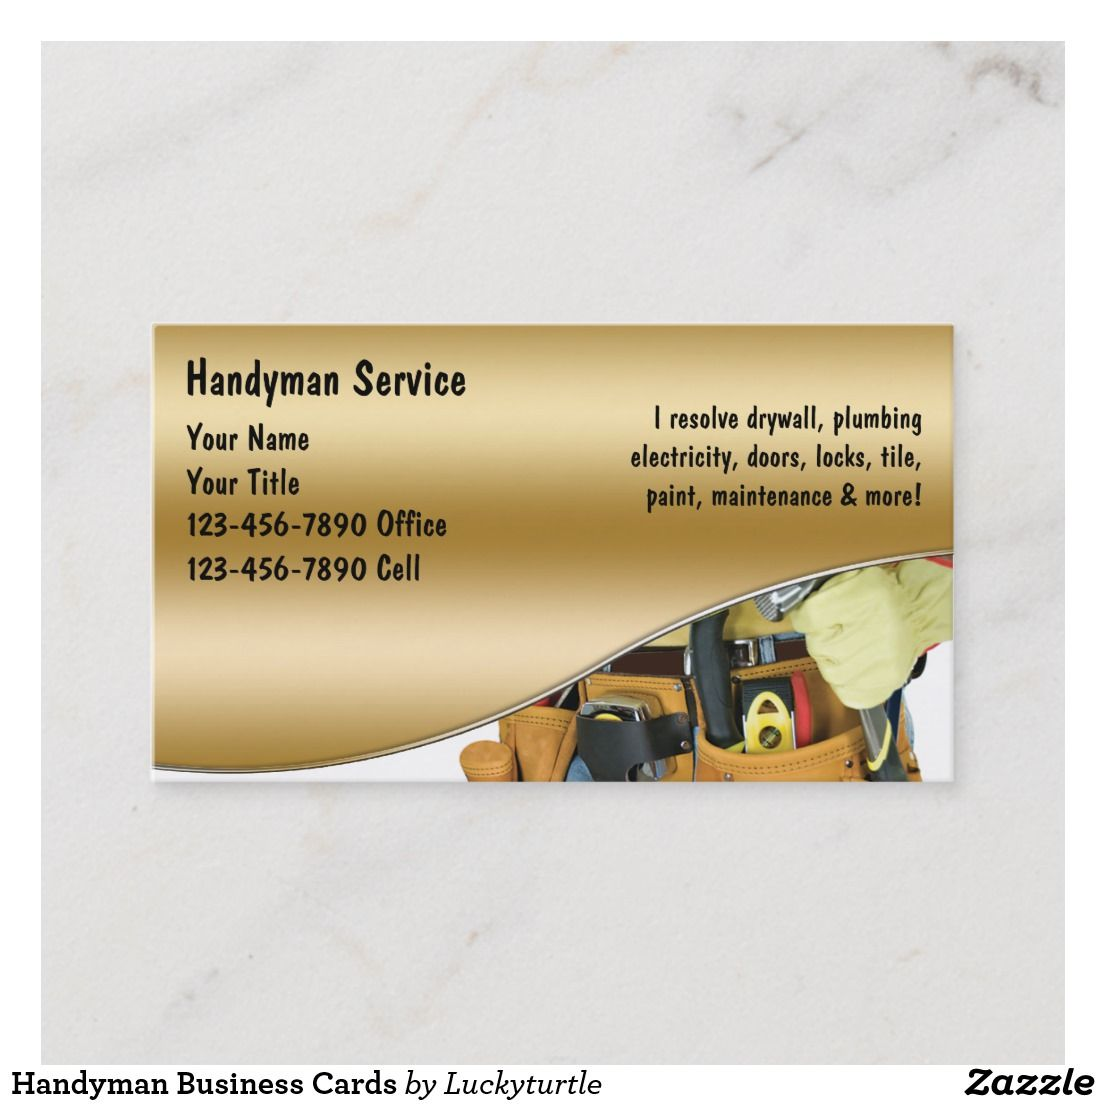 Handyman business cards handyman business